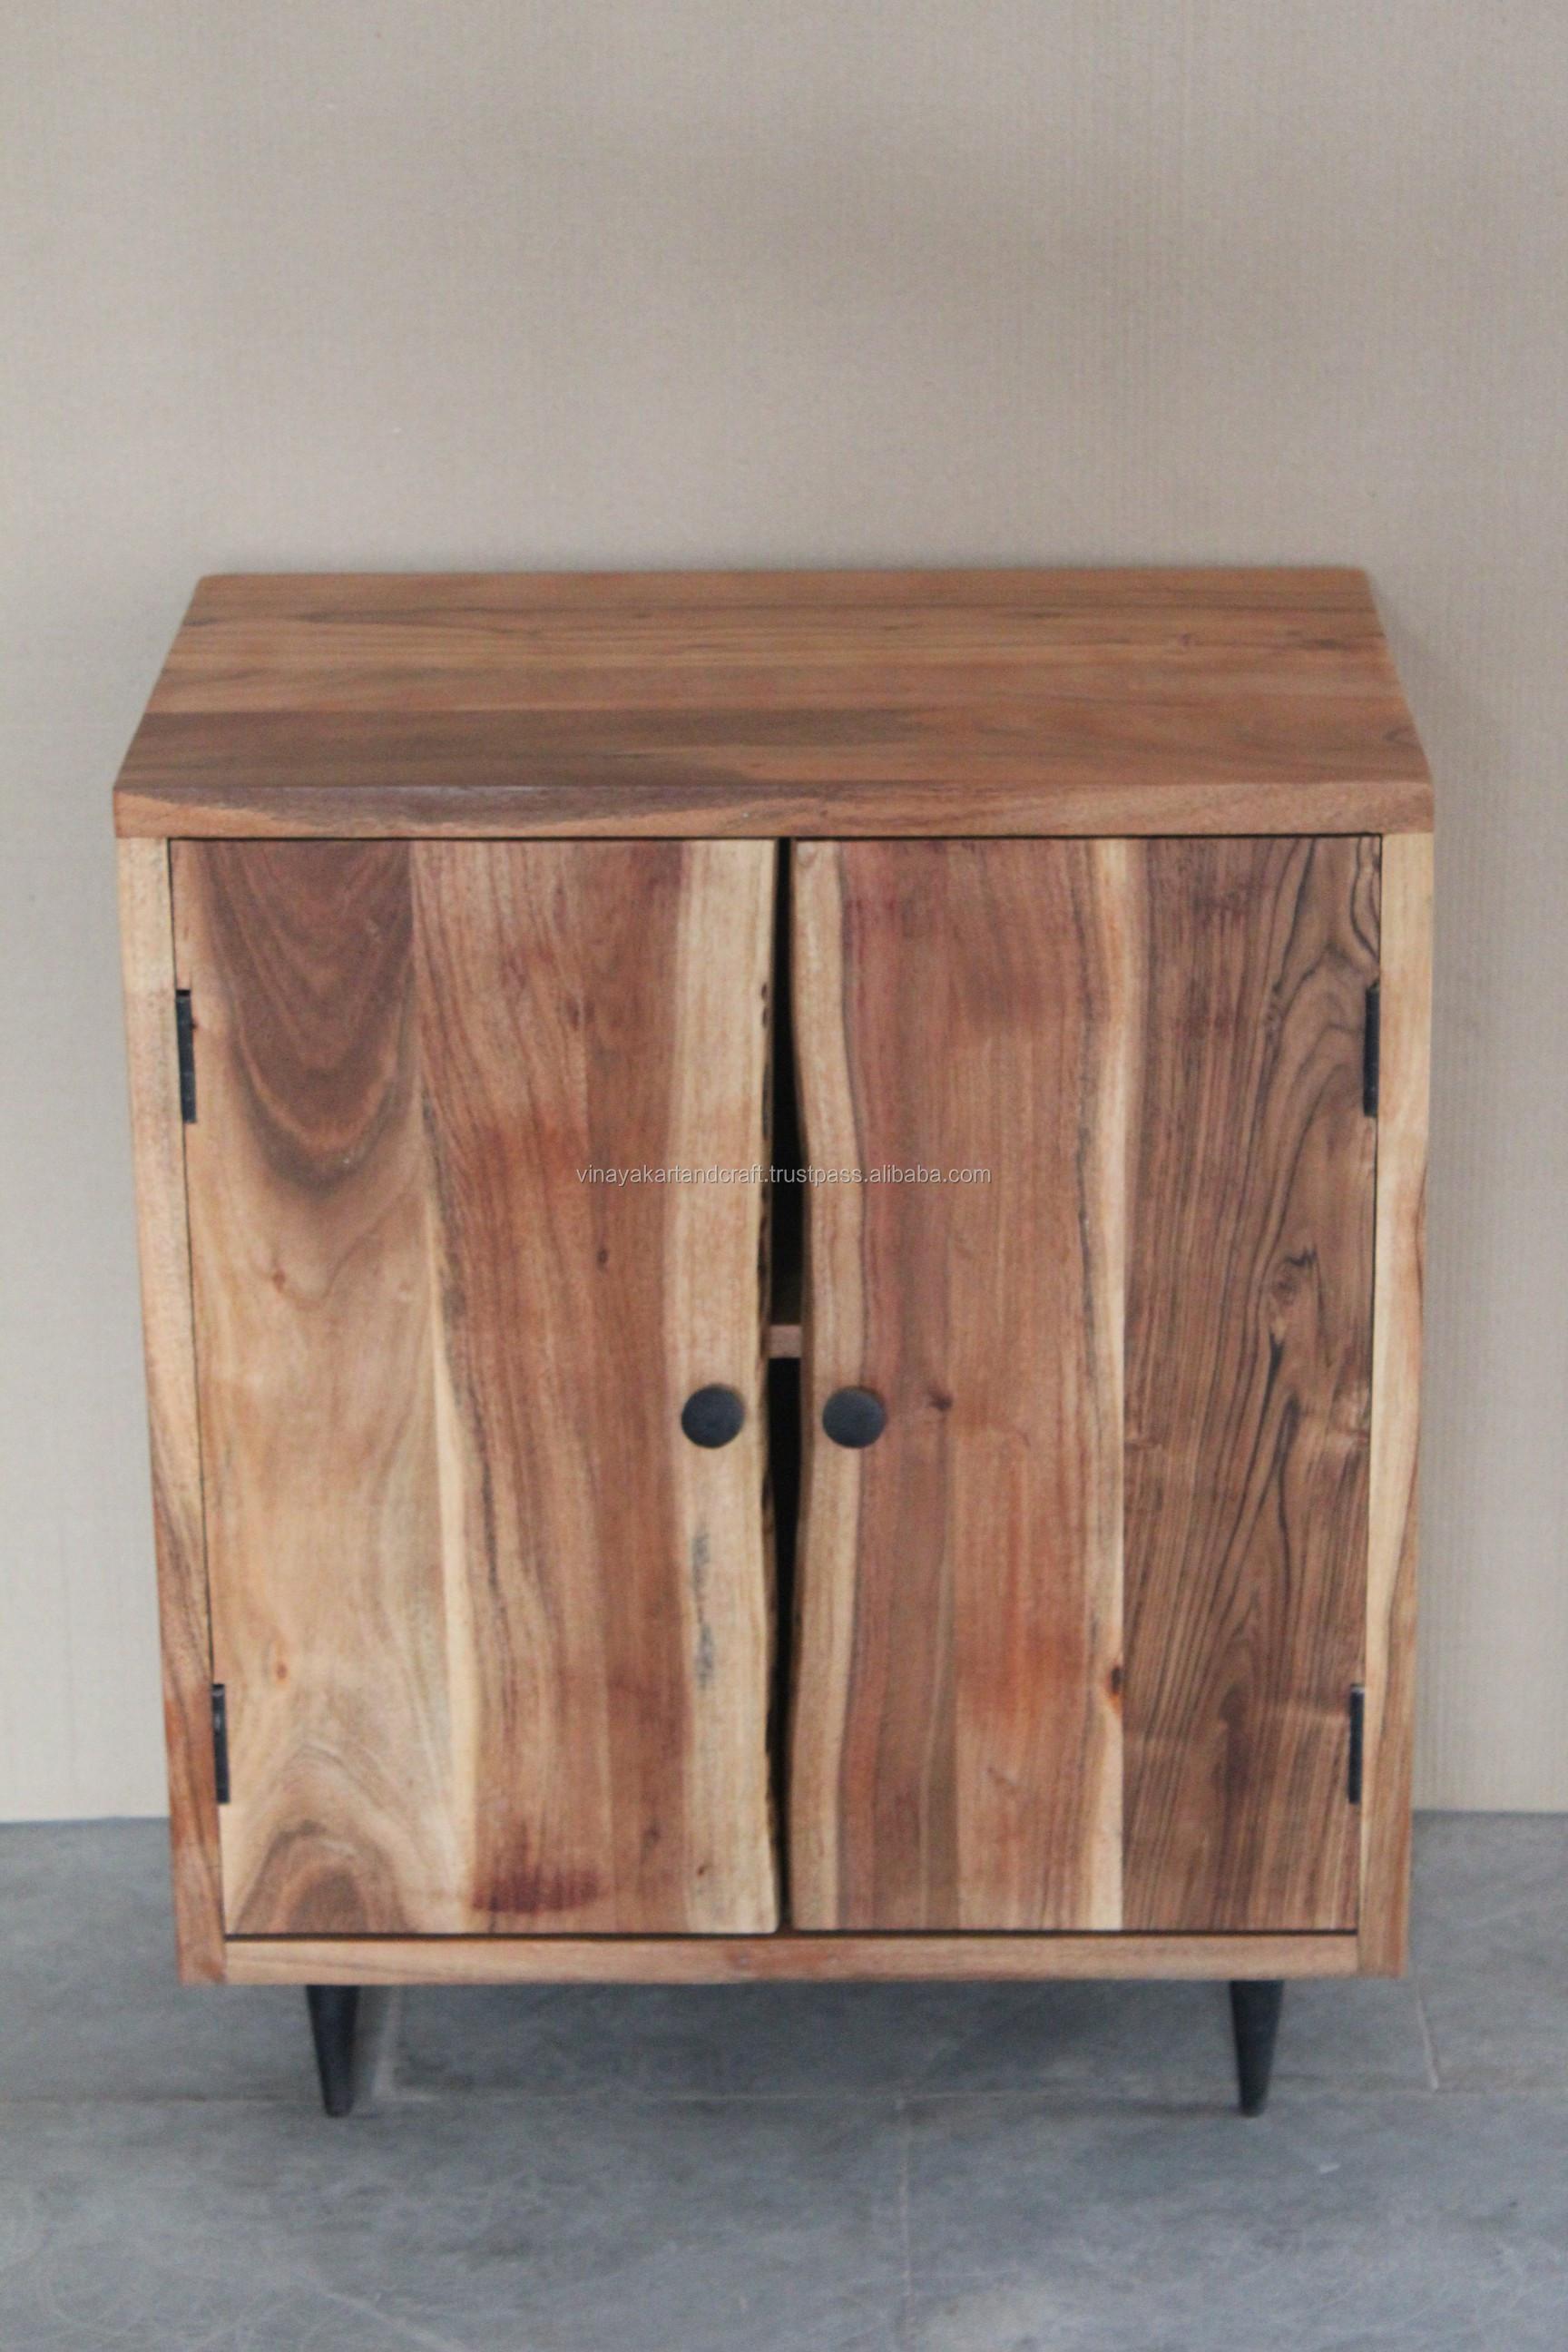 Modern living room wooden cabinet living room furniture antique live edge acacia wood cabinet vintage solid wood cabinet buy wooden cabinetvitrine